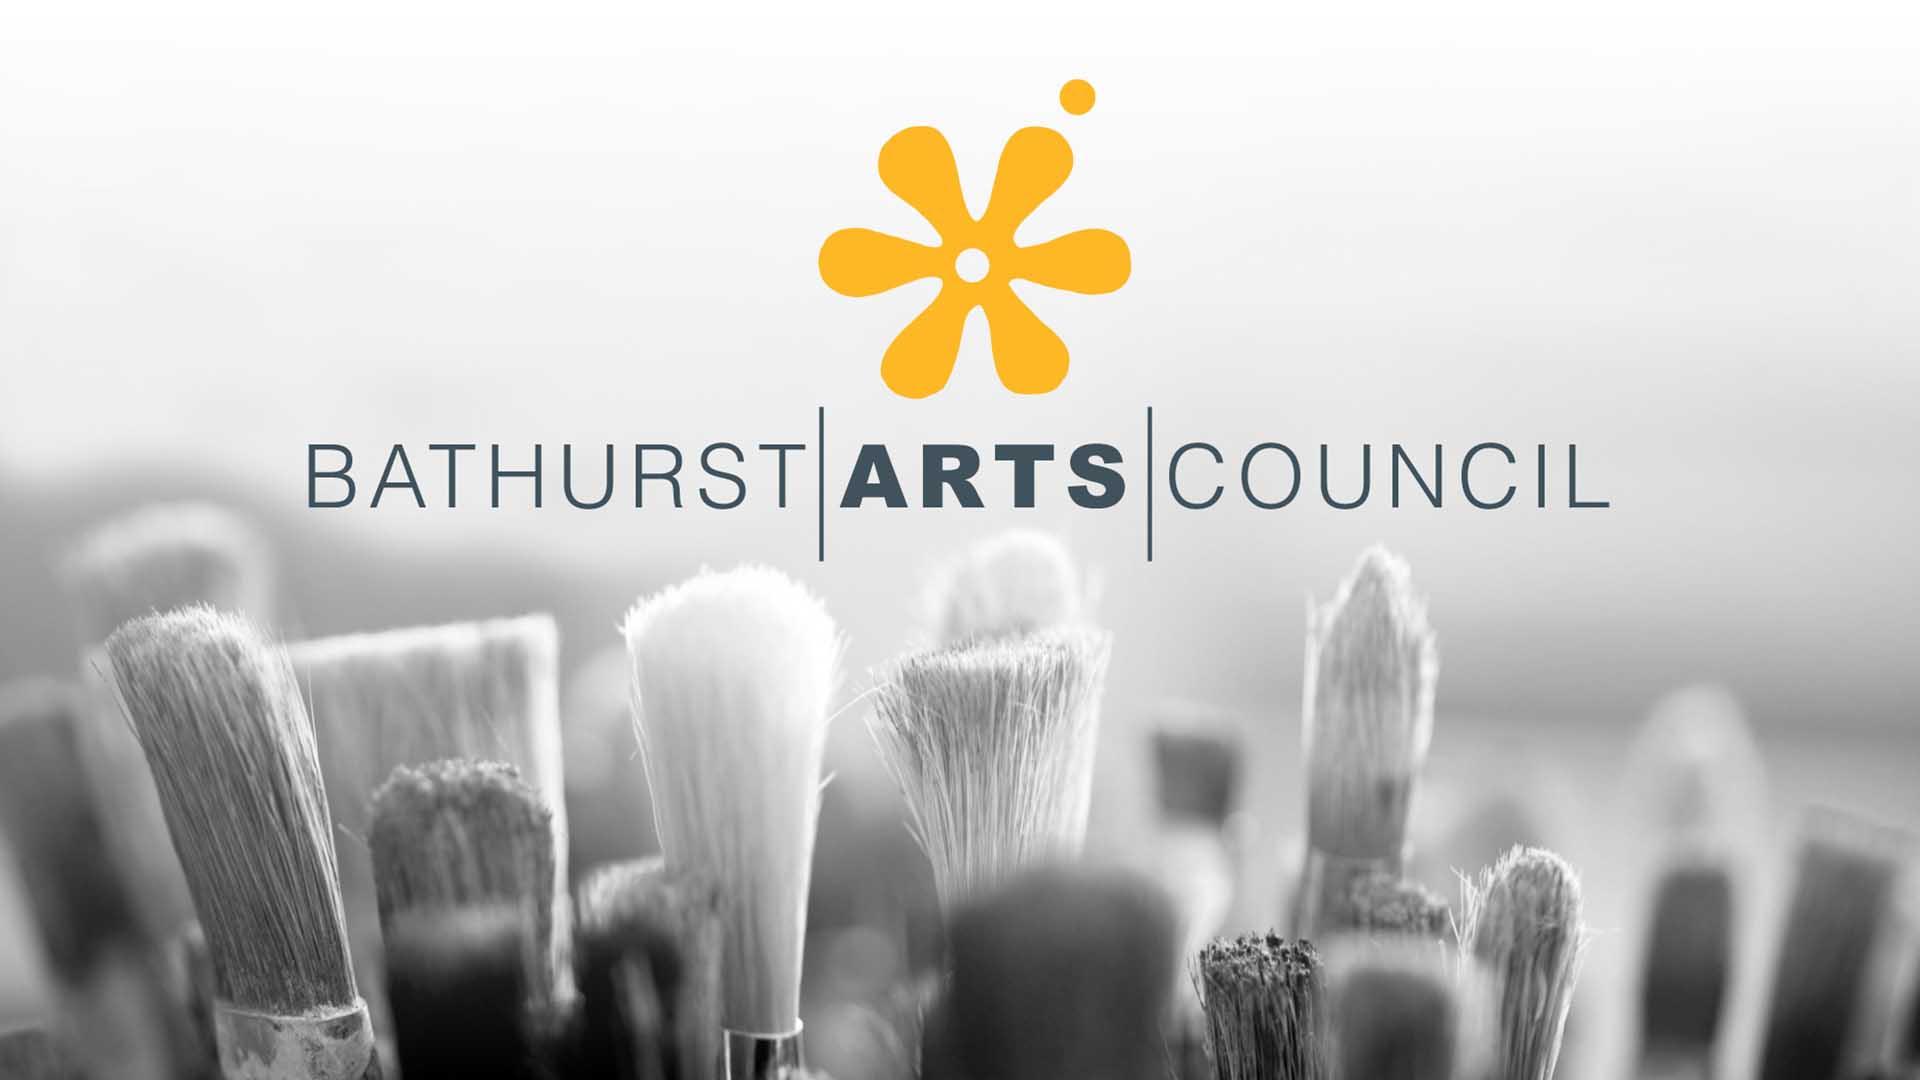 Portfolio - Bathurst Arts Council Logo | StartleArt Graphic Design